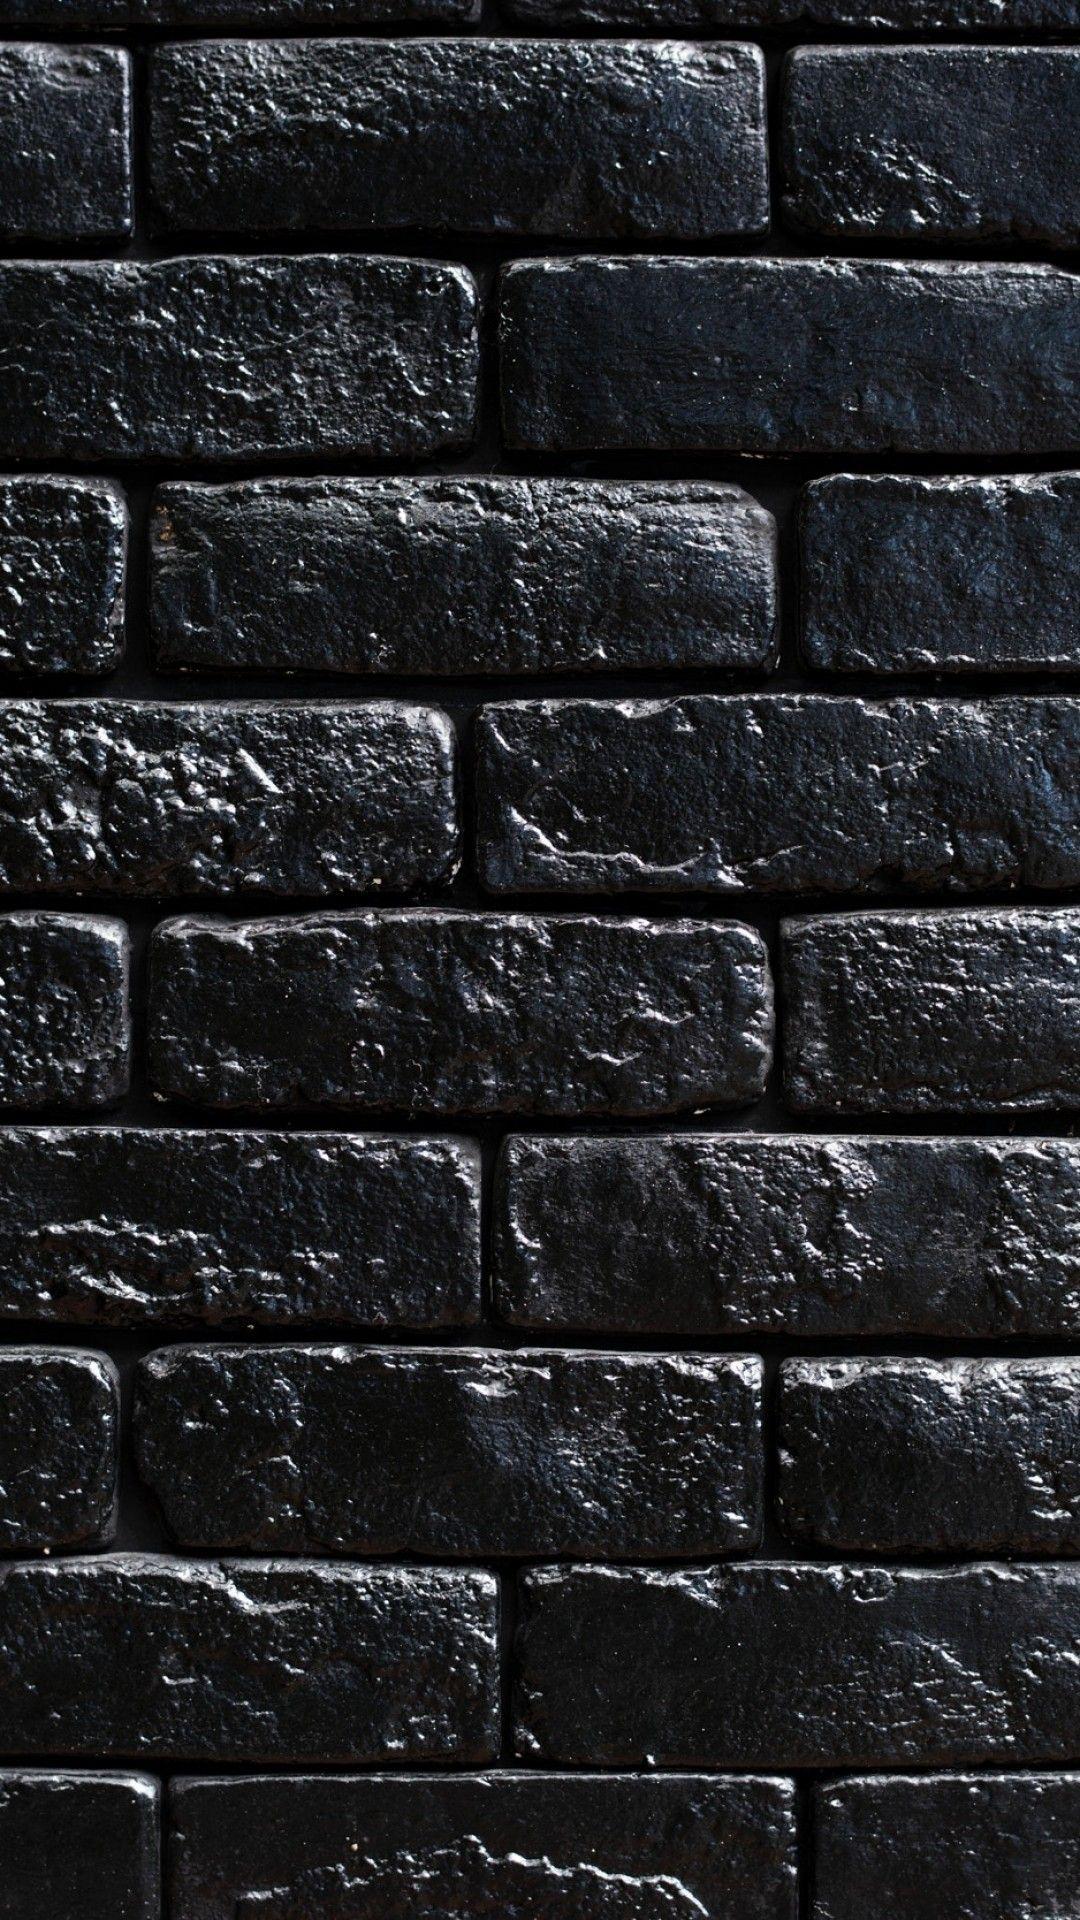 Brick Wallpaper Full Hd Hupages Download Iphone Wallpapers Painting Wallpaper Brick Wallpaper Cool Wallpaper